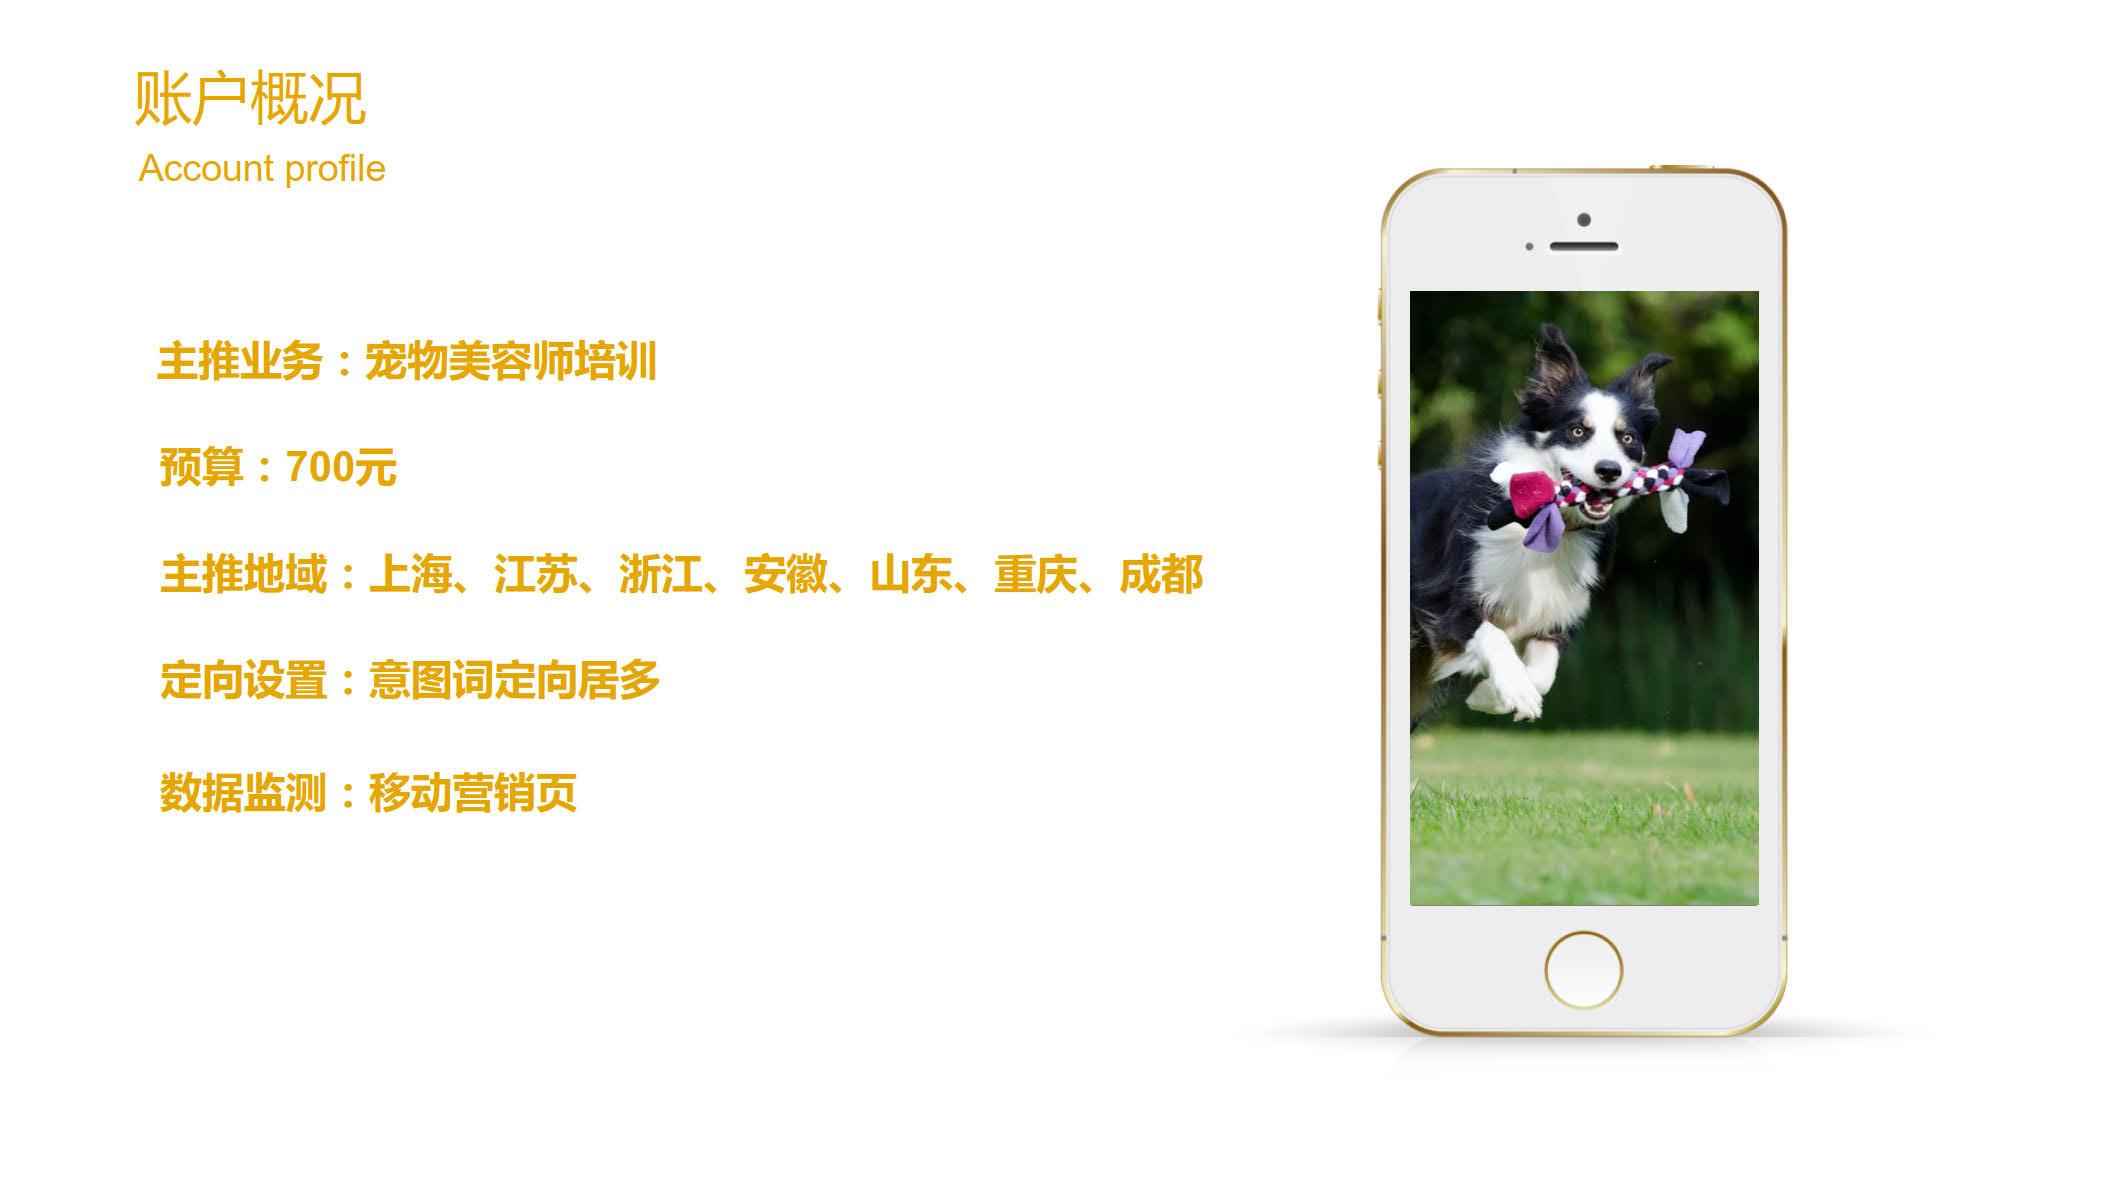 sh政轩-张燕惠_10.jpg